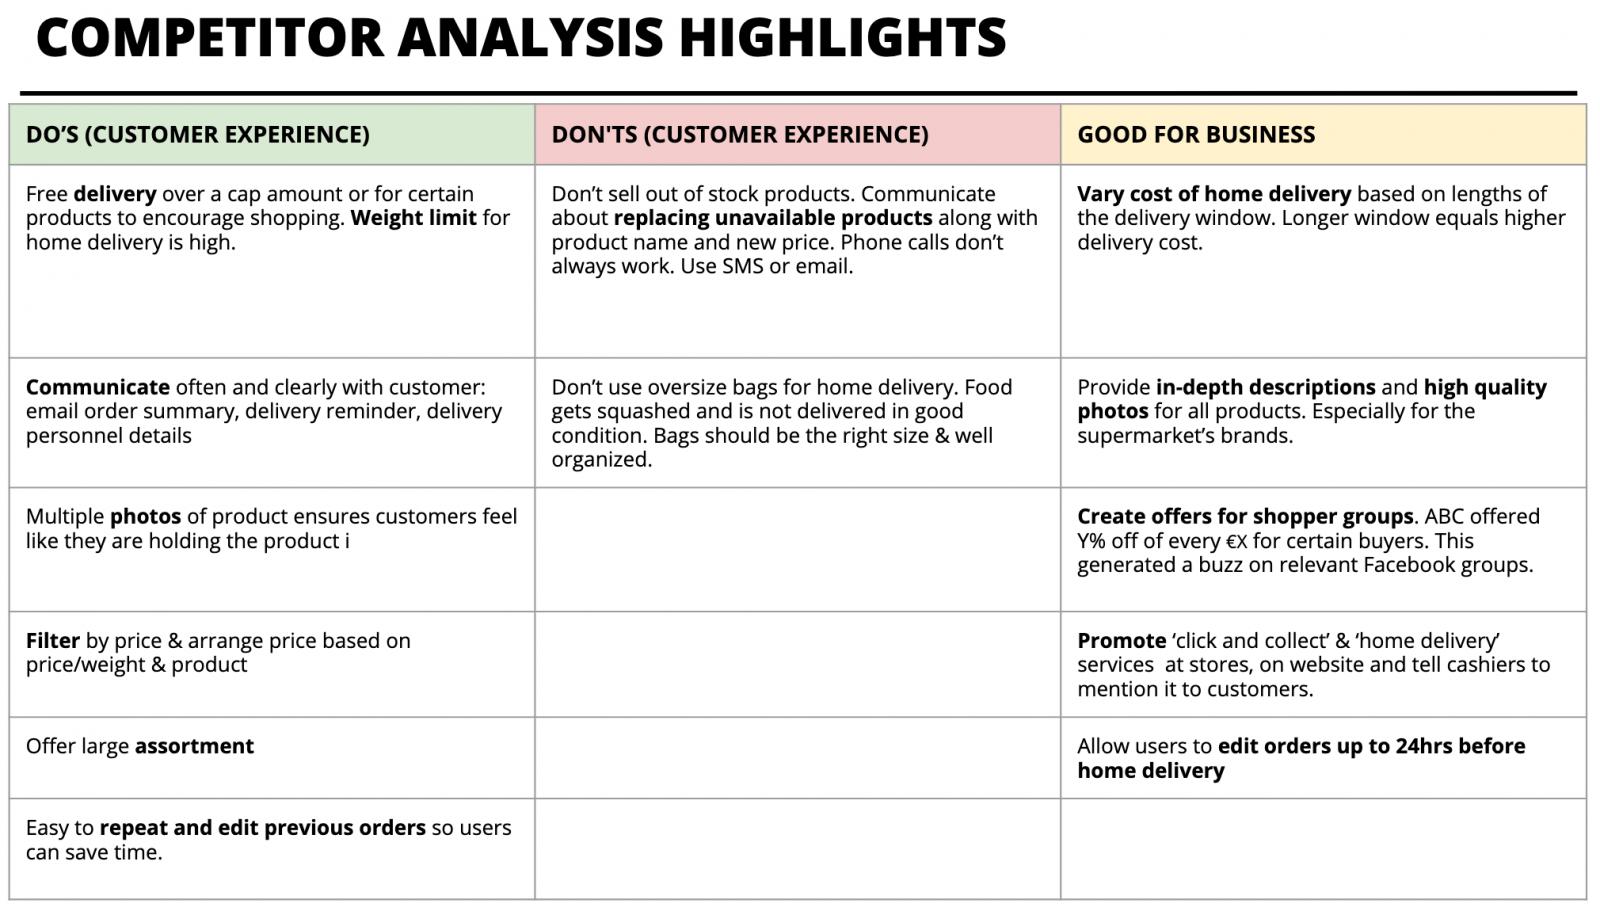 analysis highlights